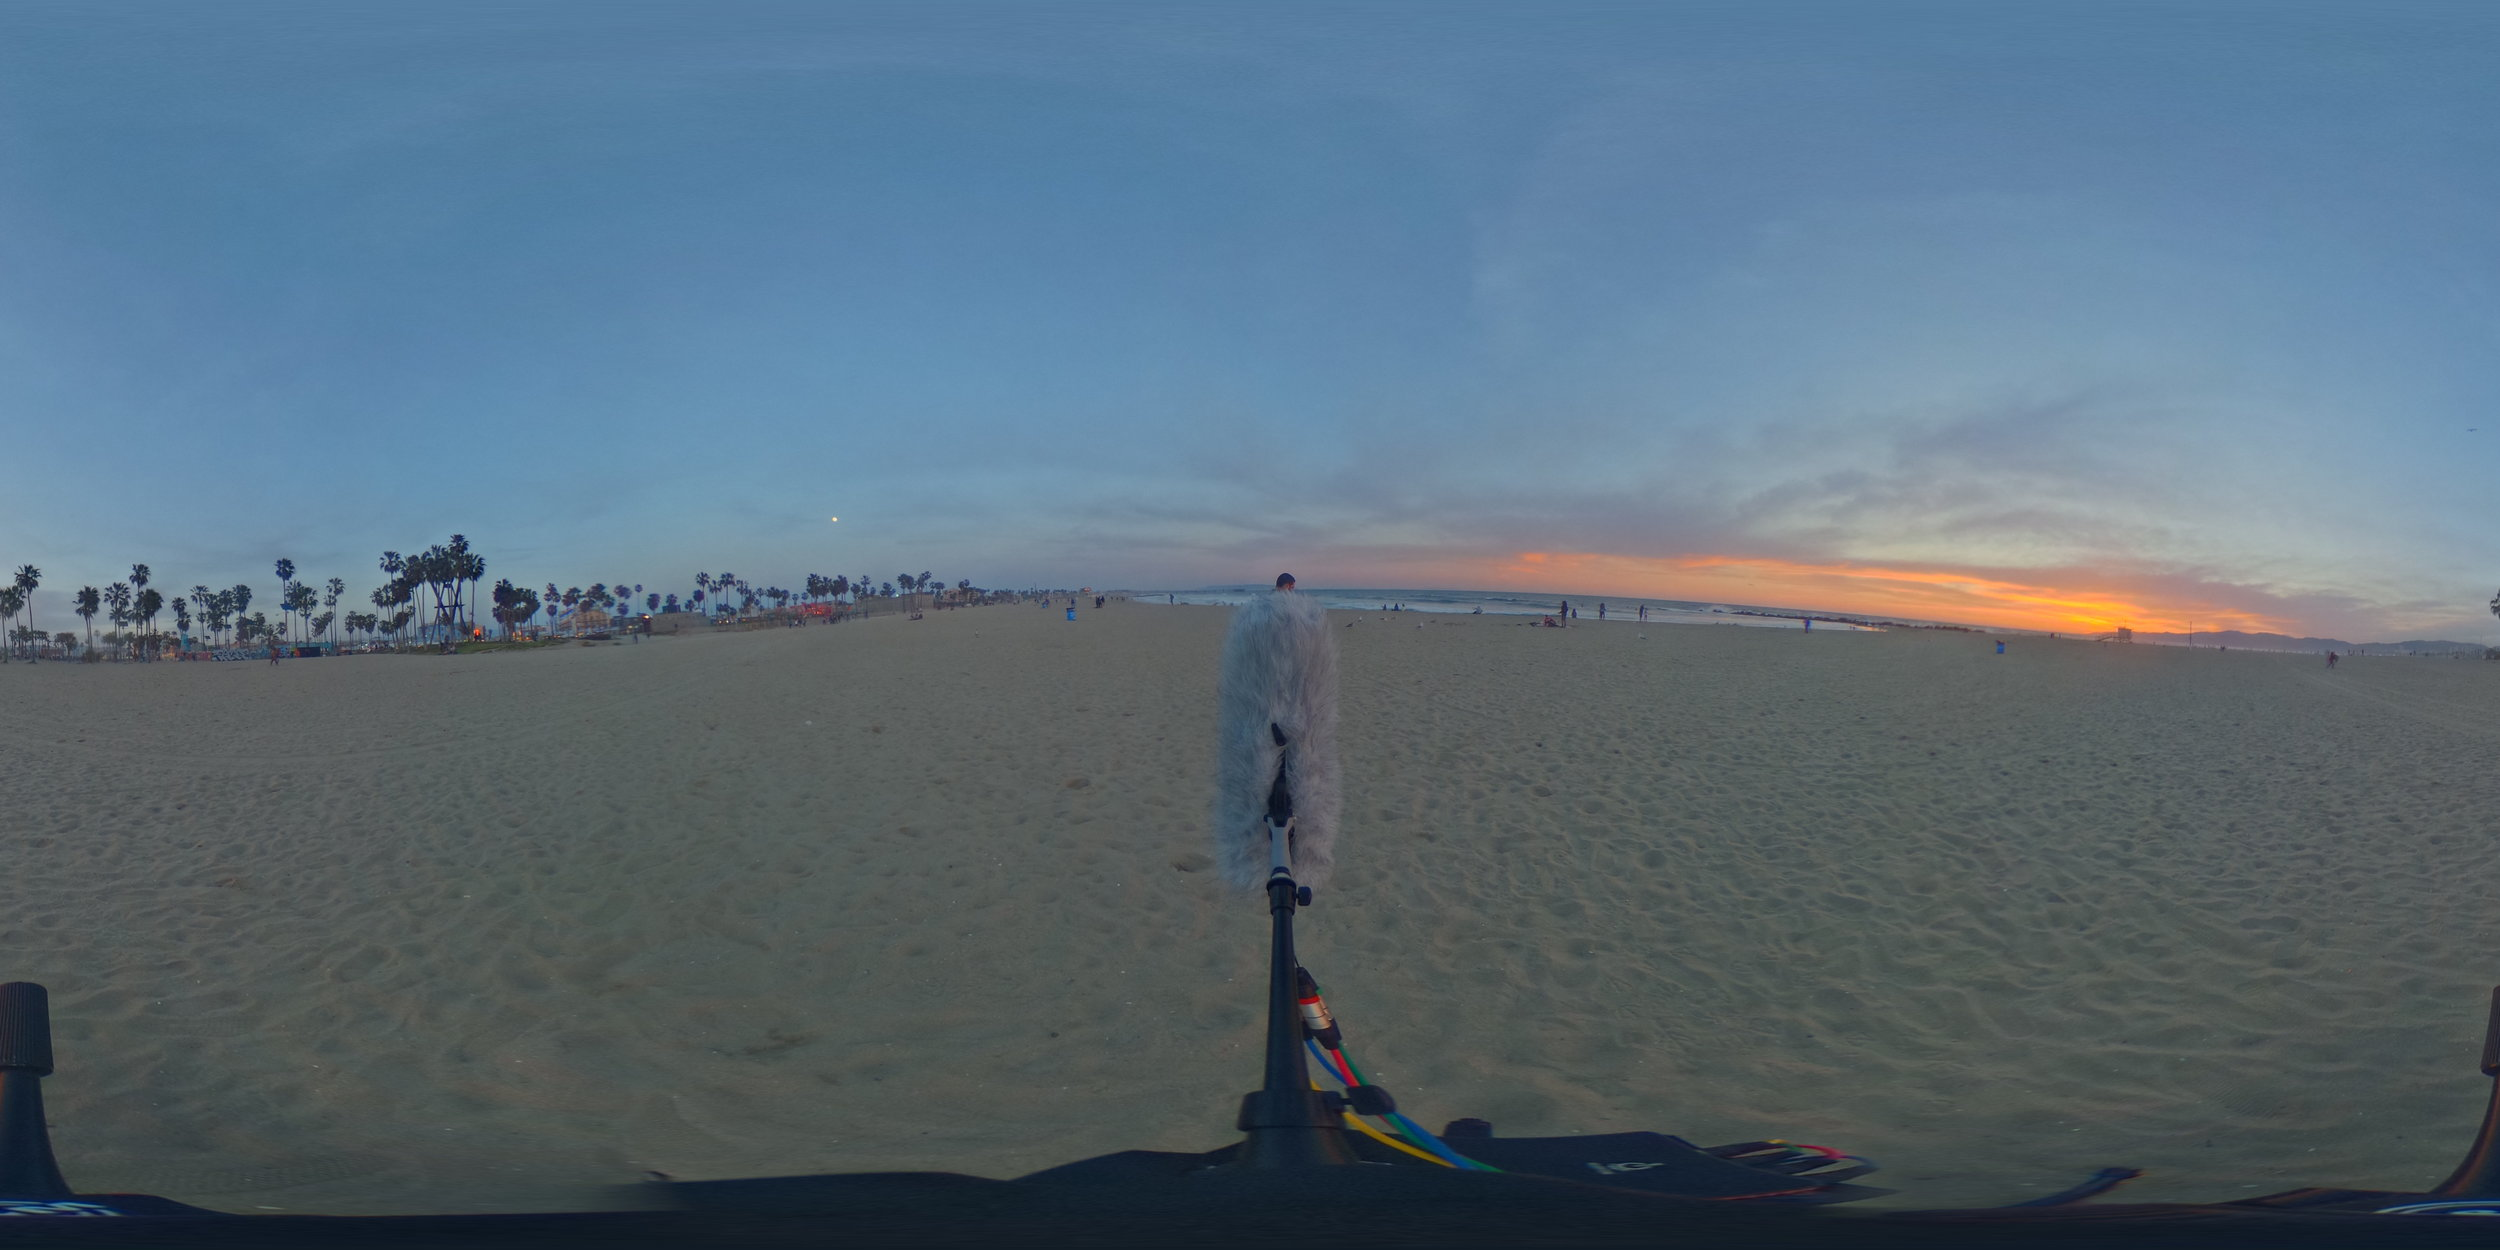 EXT_Sunset_Beach_Seagulls_MediumWaves_VeryDistantWalla_PlaneBy_JPEG.JPG